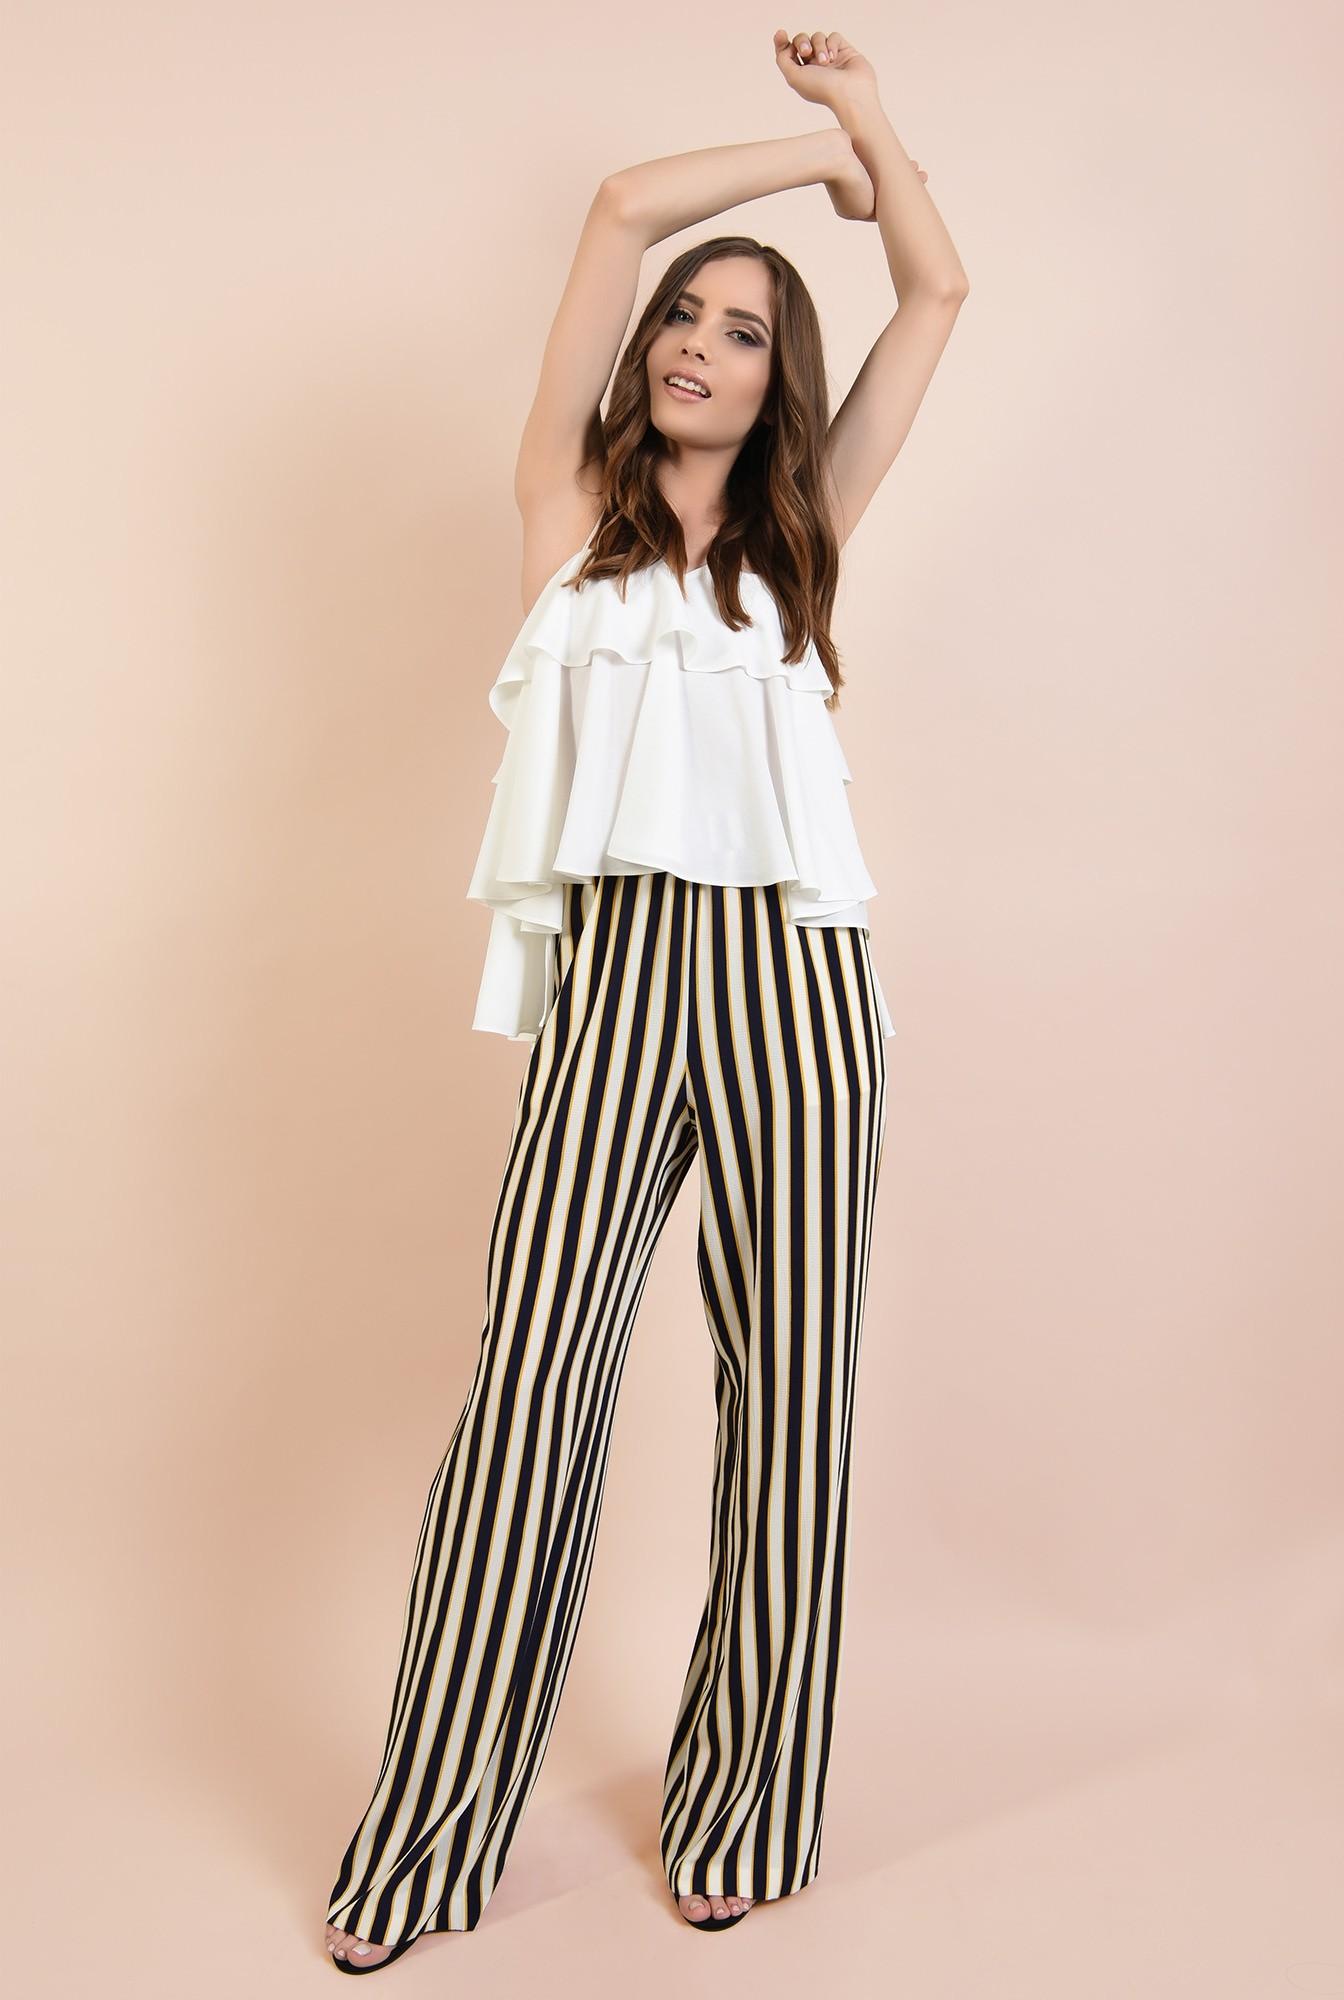 0 - 360 - pantaloni de zi, croi larg, dungi multicolore, betelie elastica